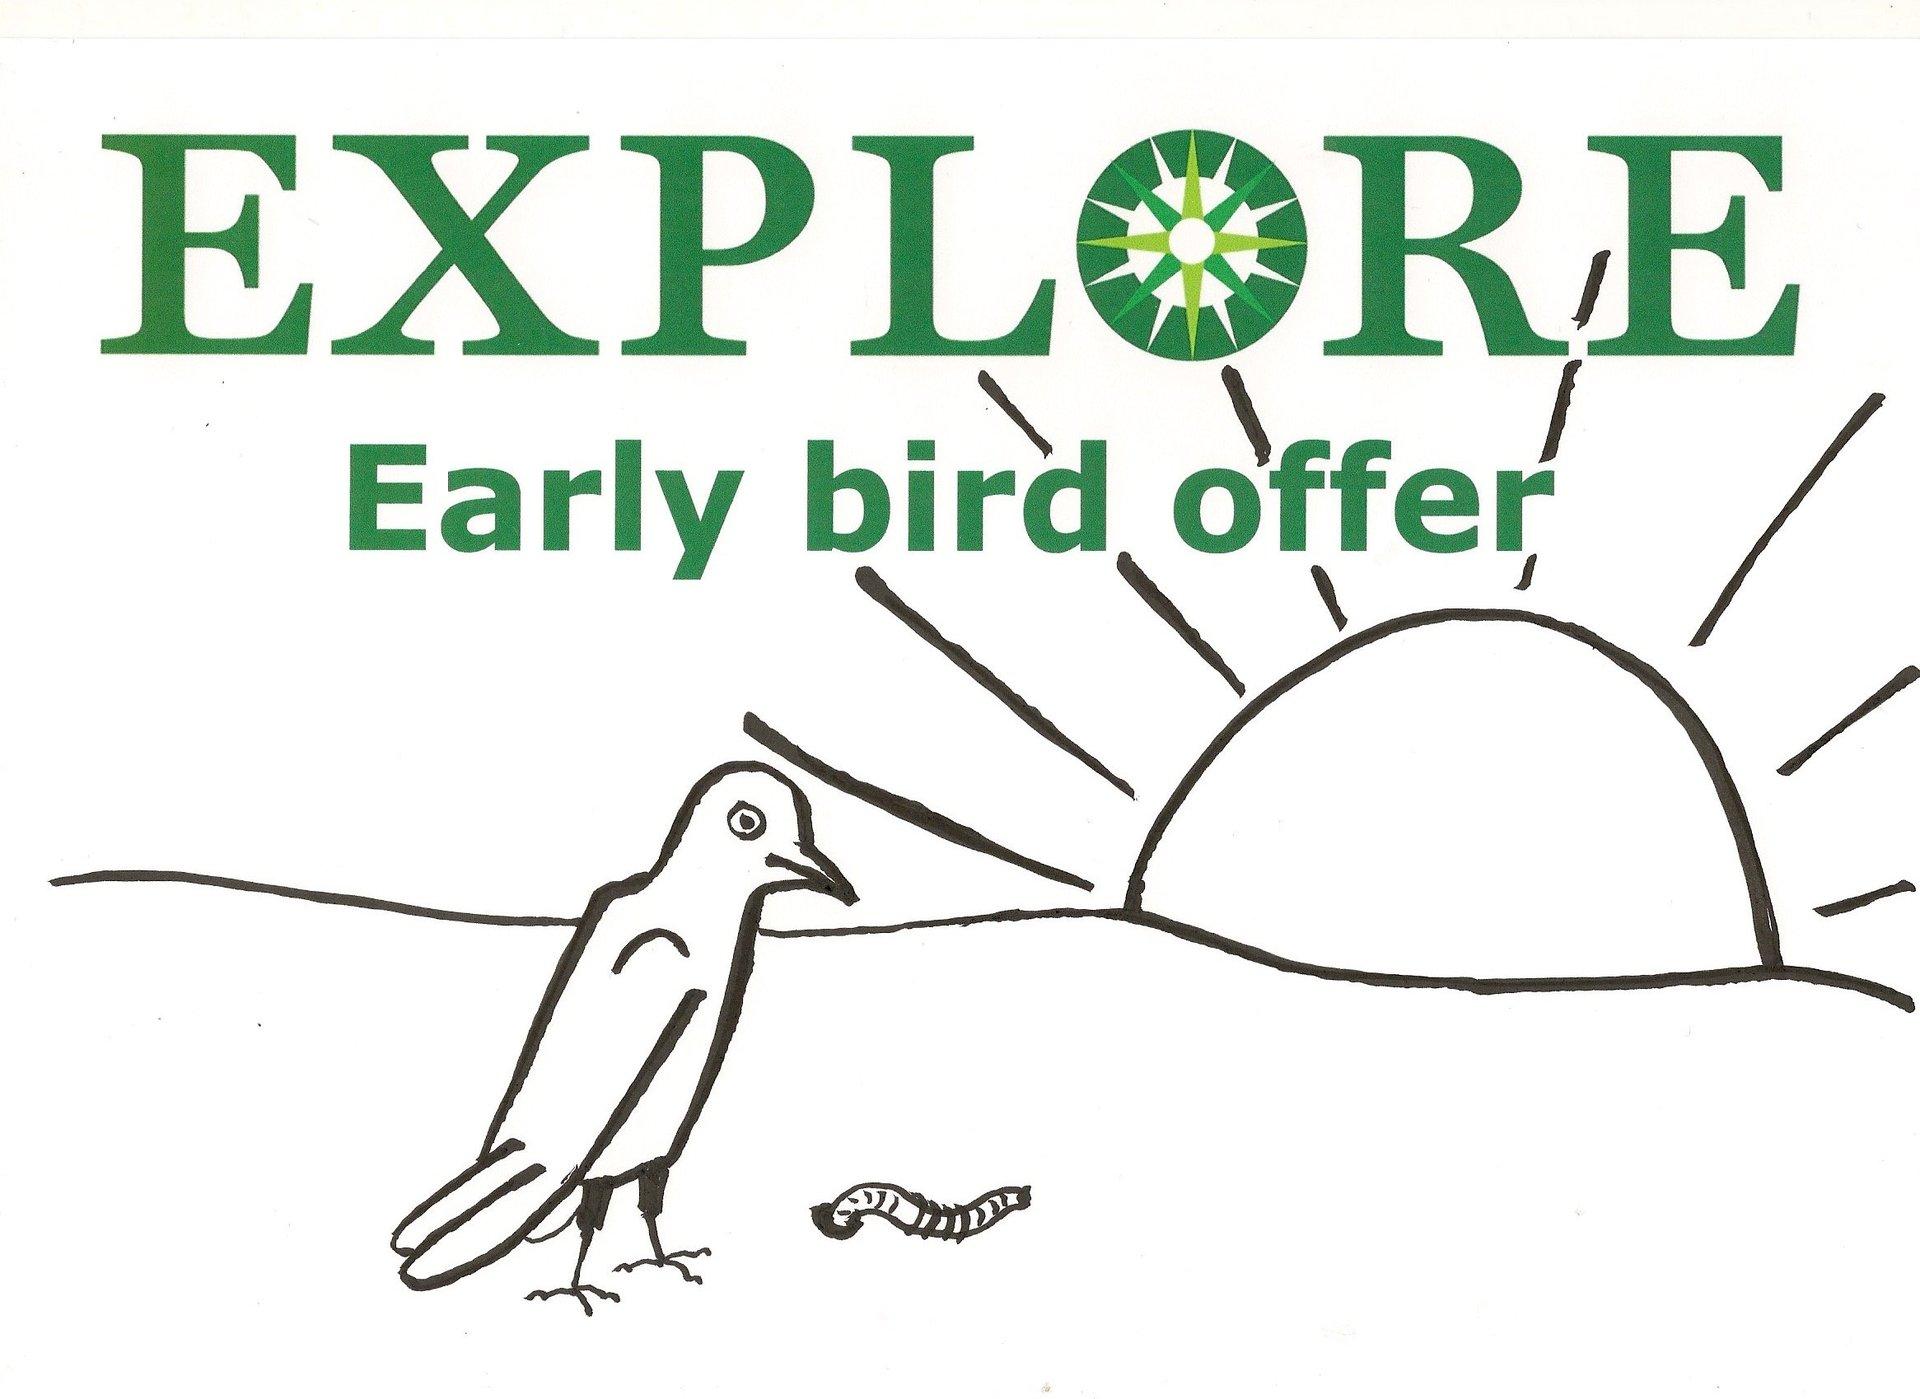 Explore lifelong learning 2017 Early Bird adult education